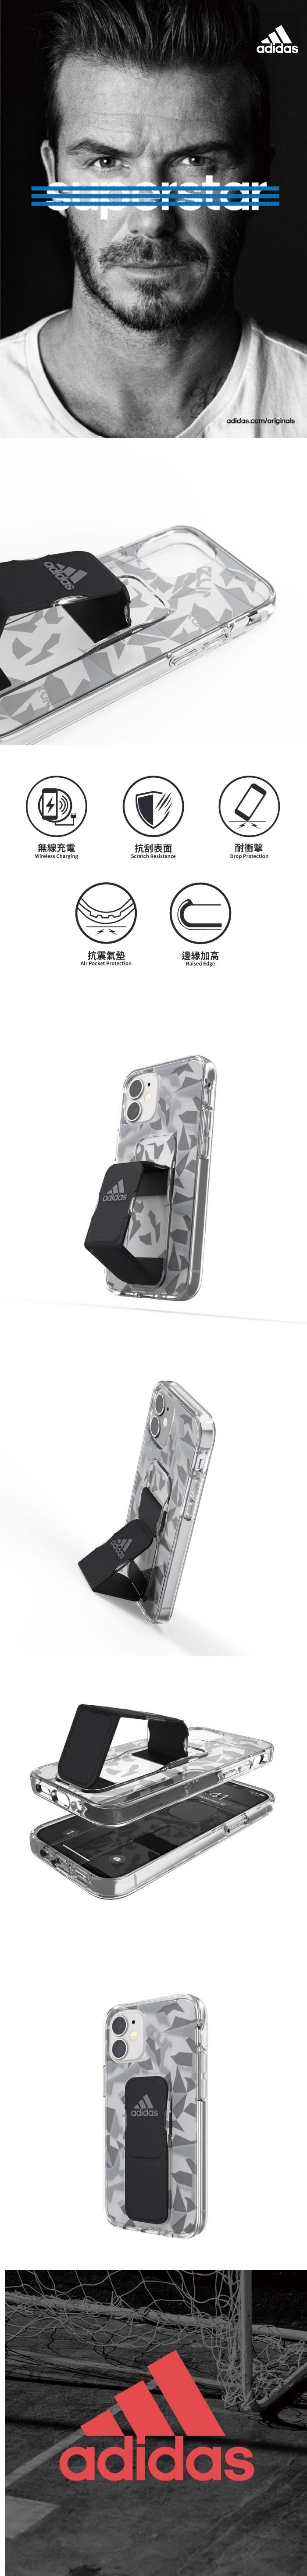 Adidas|iPhone 12 mini 手機殼 Sport 幾何圖形支架 黑色